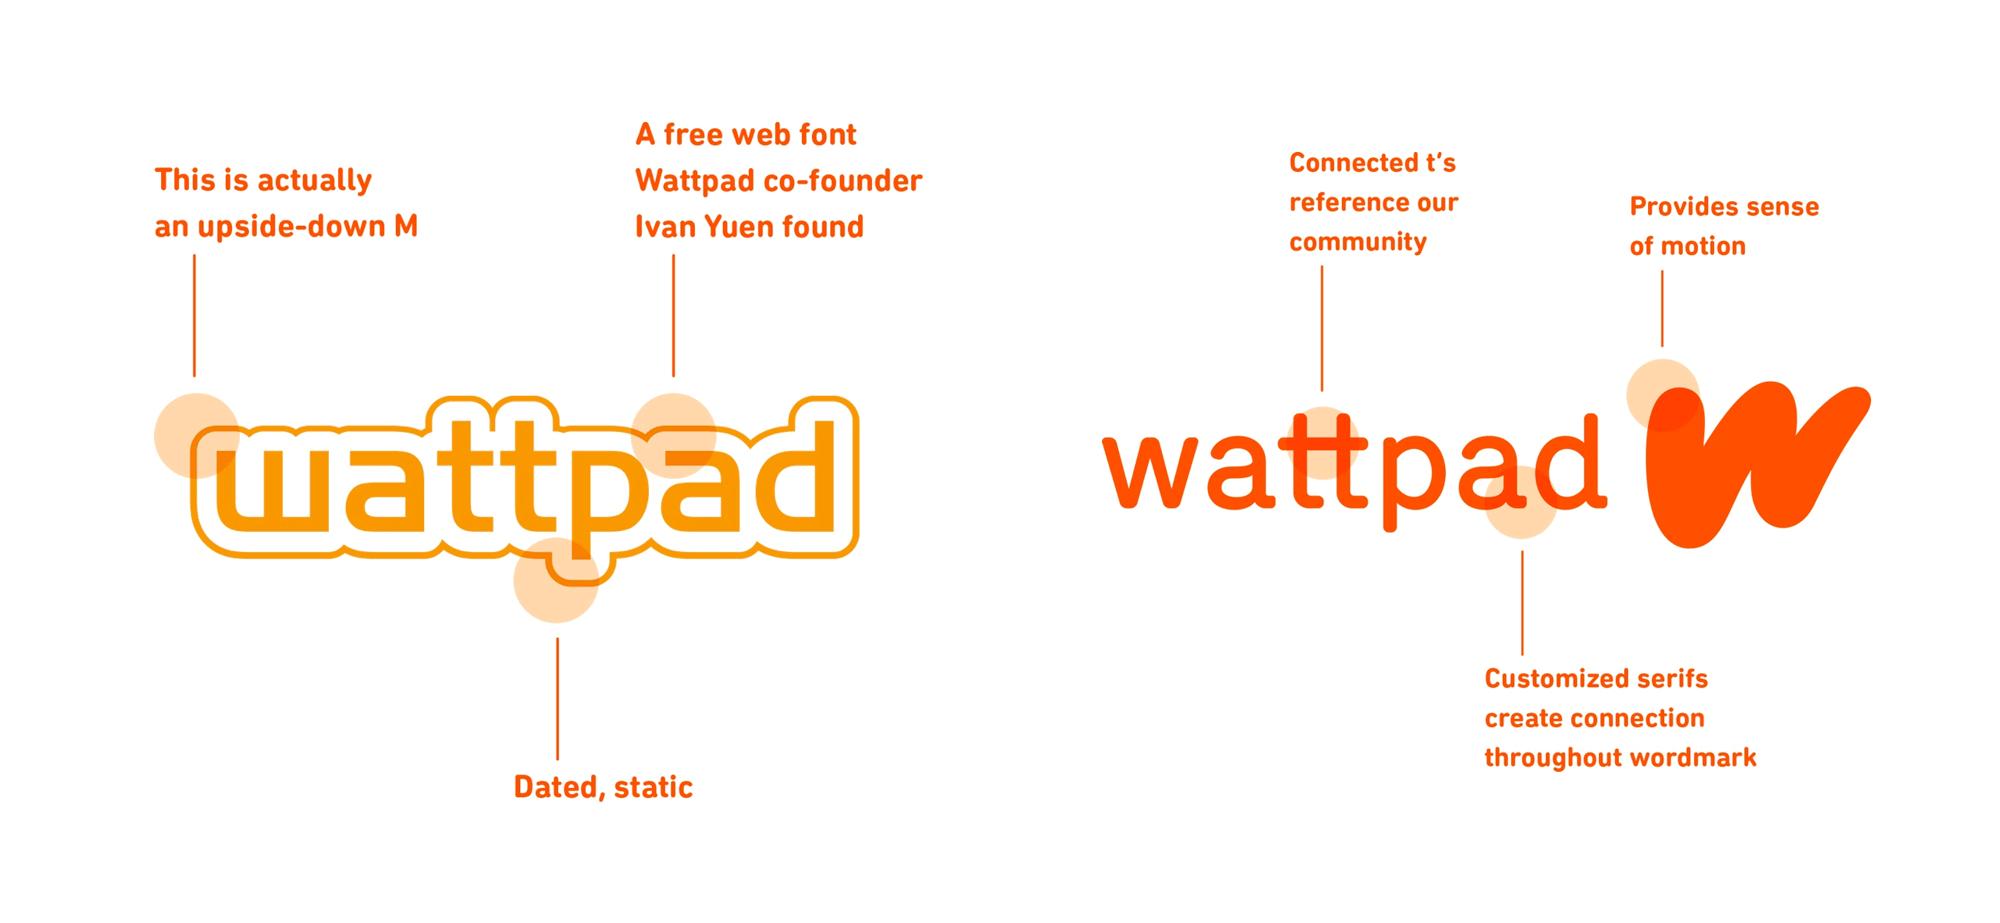 Brand New: New Logo and Identity for Wattpad